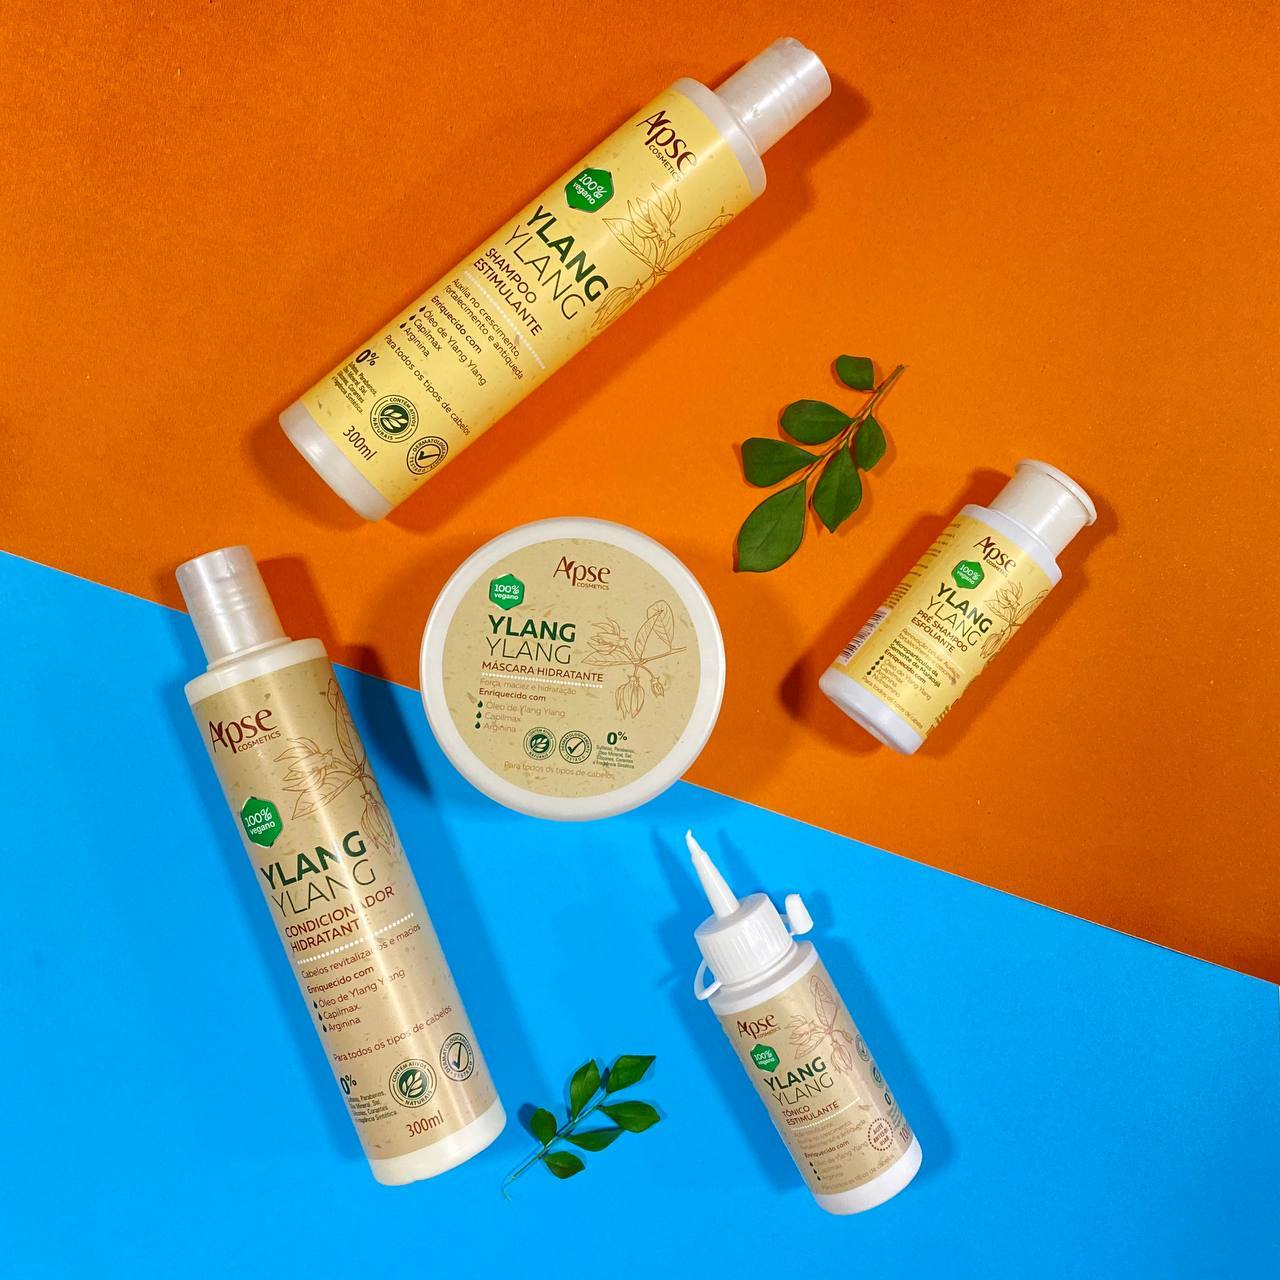 Kit Ylang Ylang (5 ITENS) - Apse Cosmetics